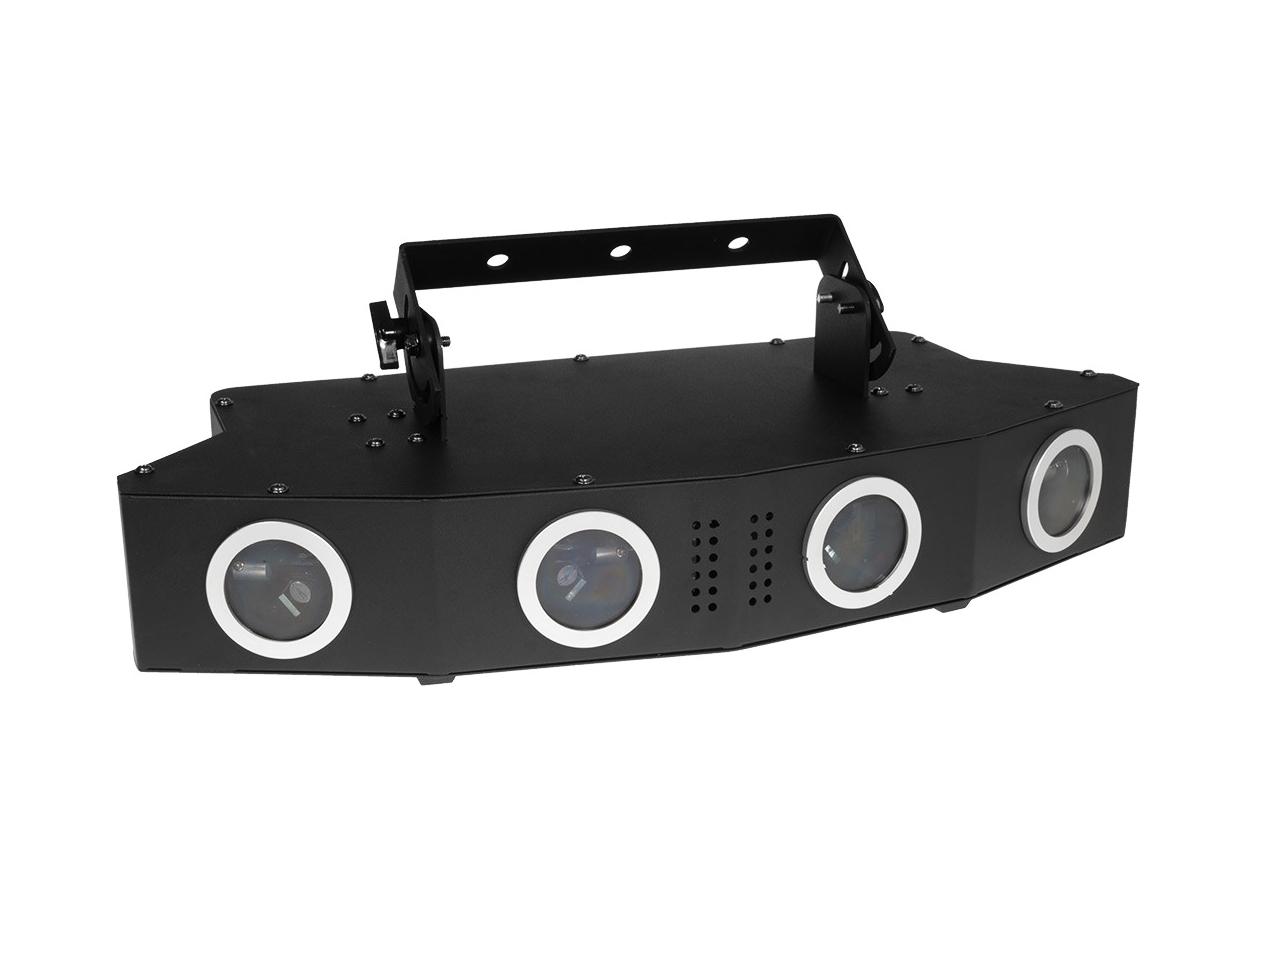 Laserworld EL-900RGB, laserový efekt 4v1, 900 mW, DMX